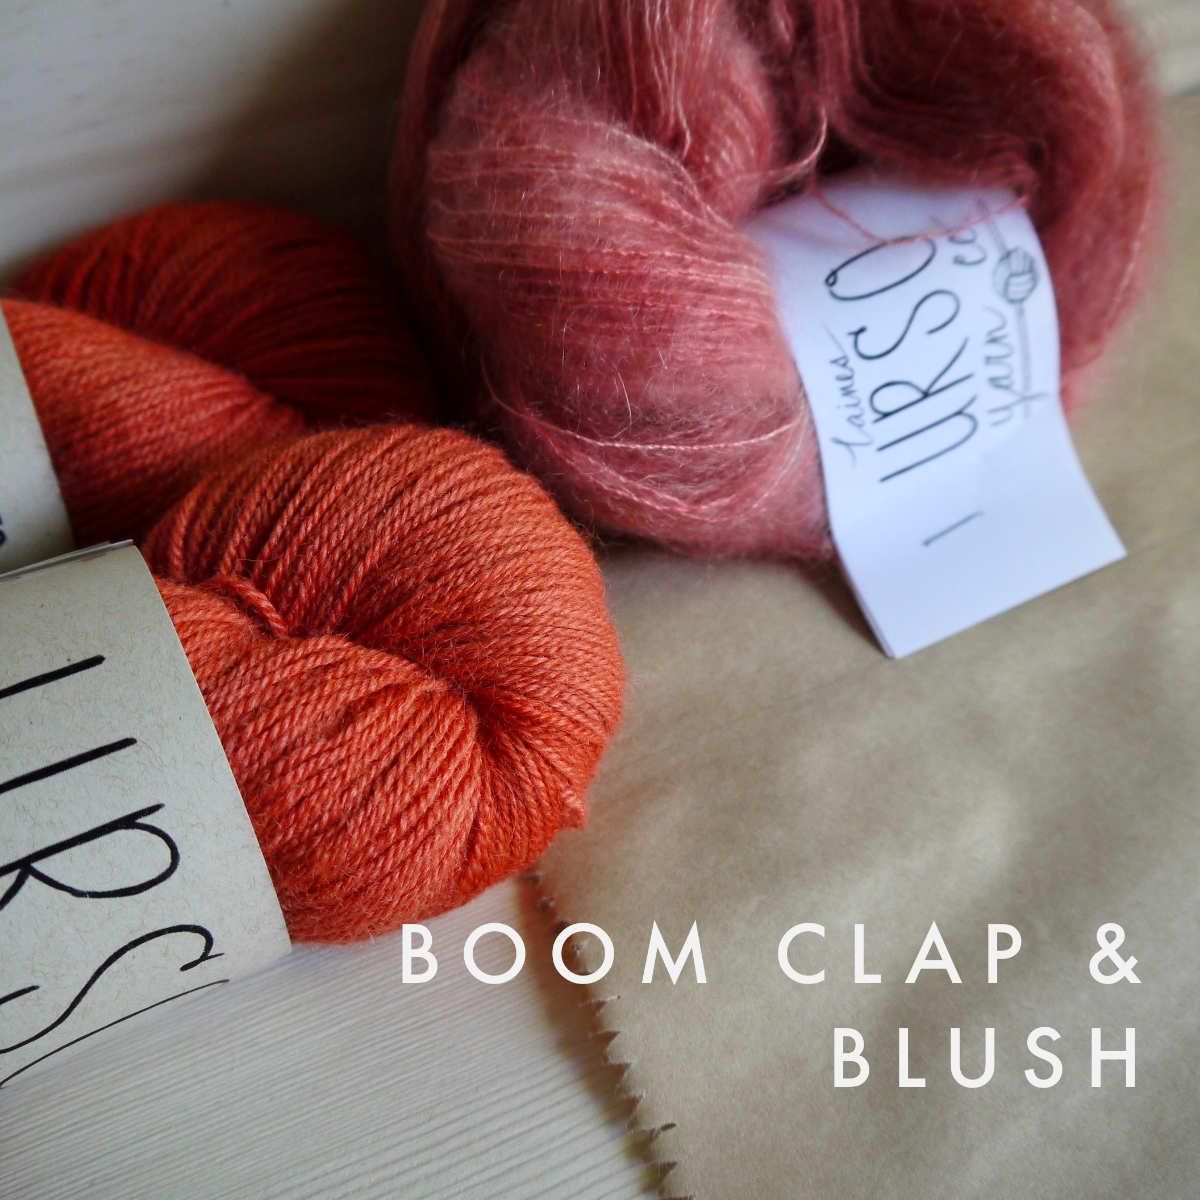 Boomclap-blush